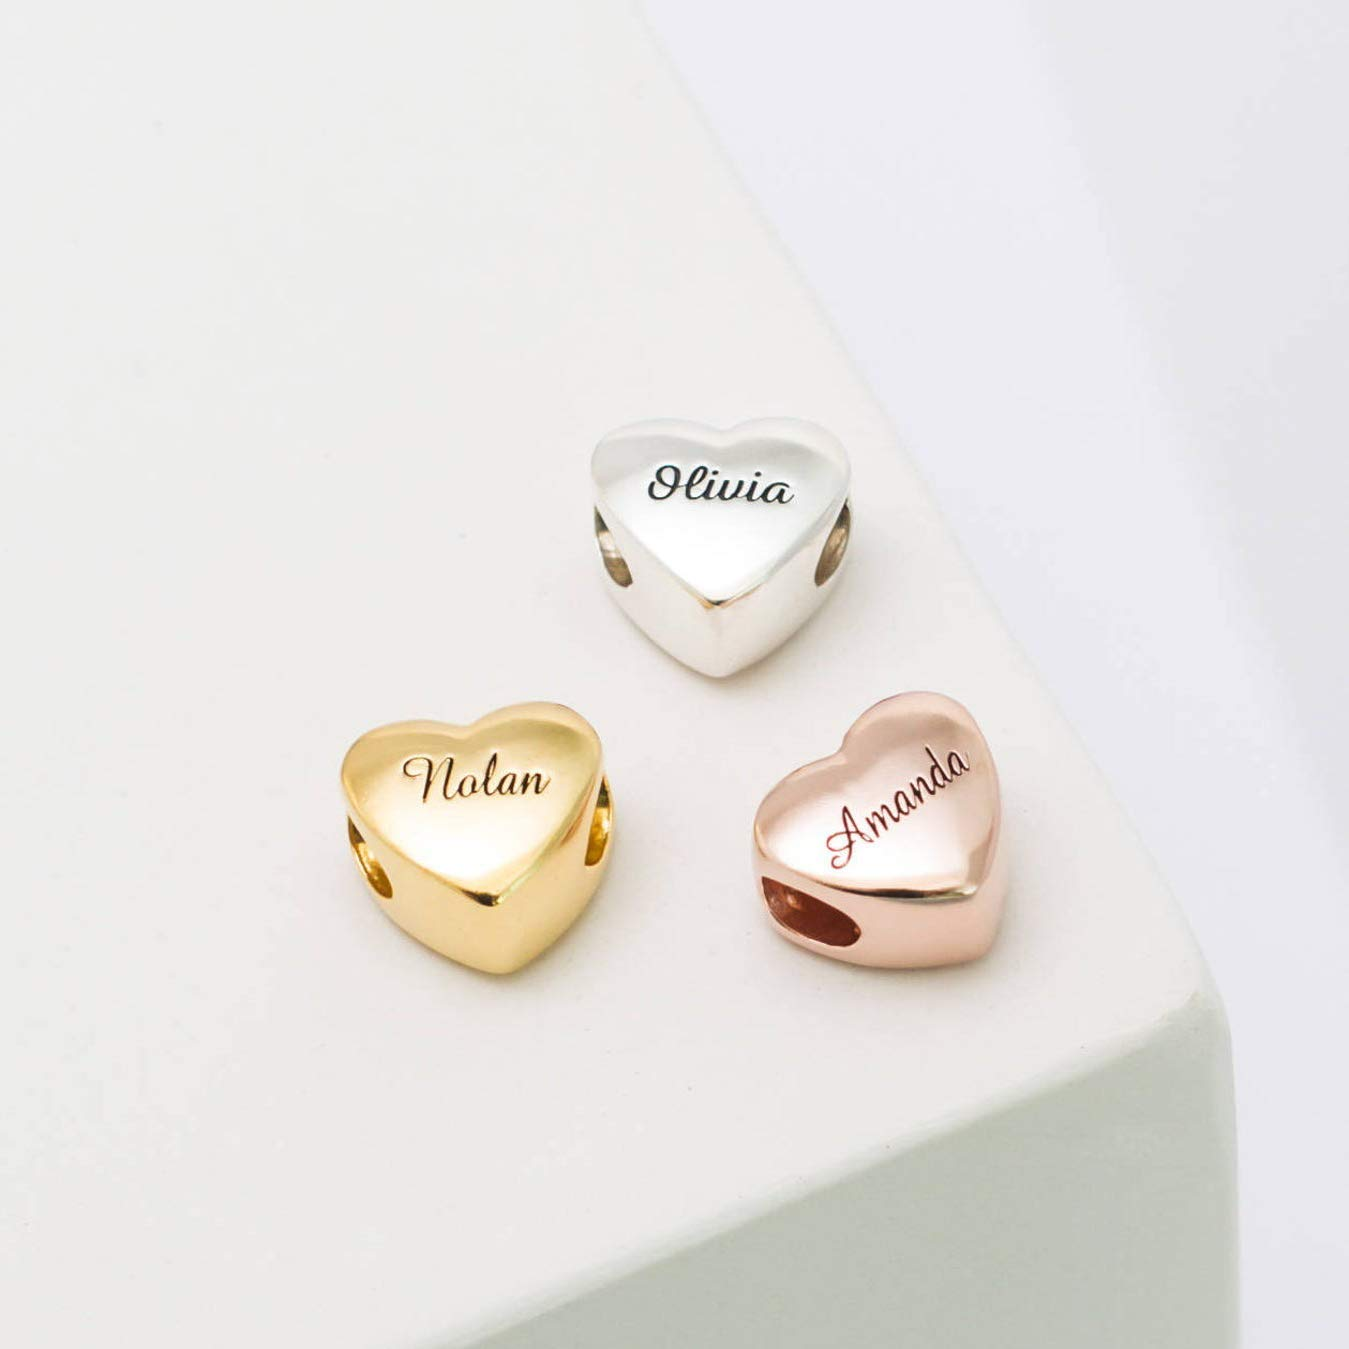 Cheap sale Silver San Antonio Mall Heart Charm Personalized Name Beads Jewelry B Custom